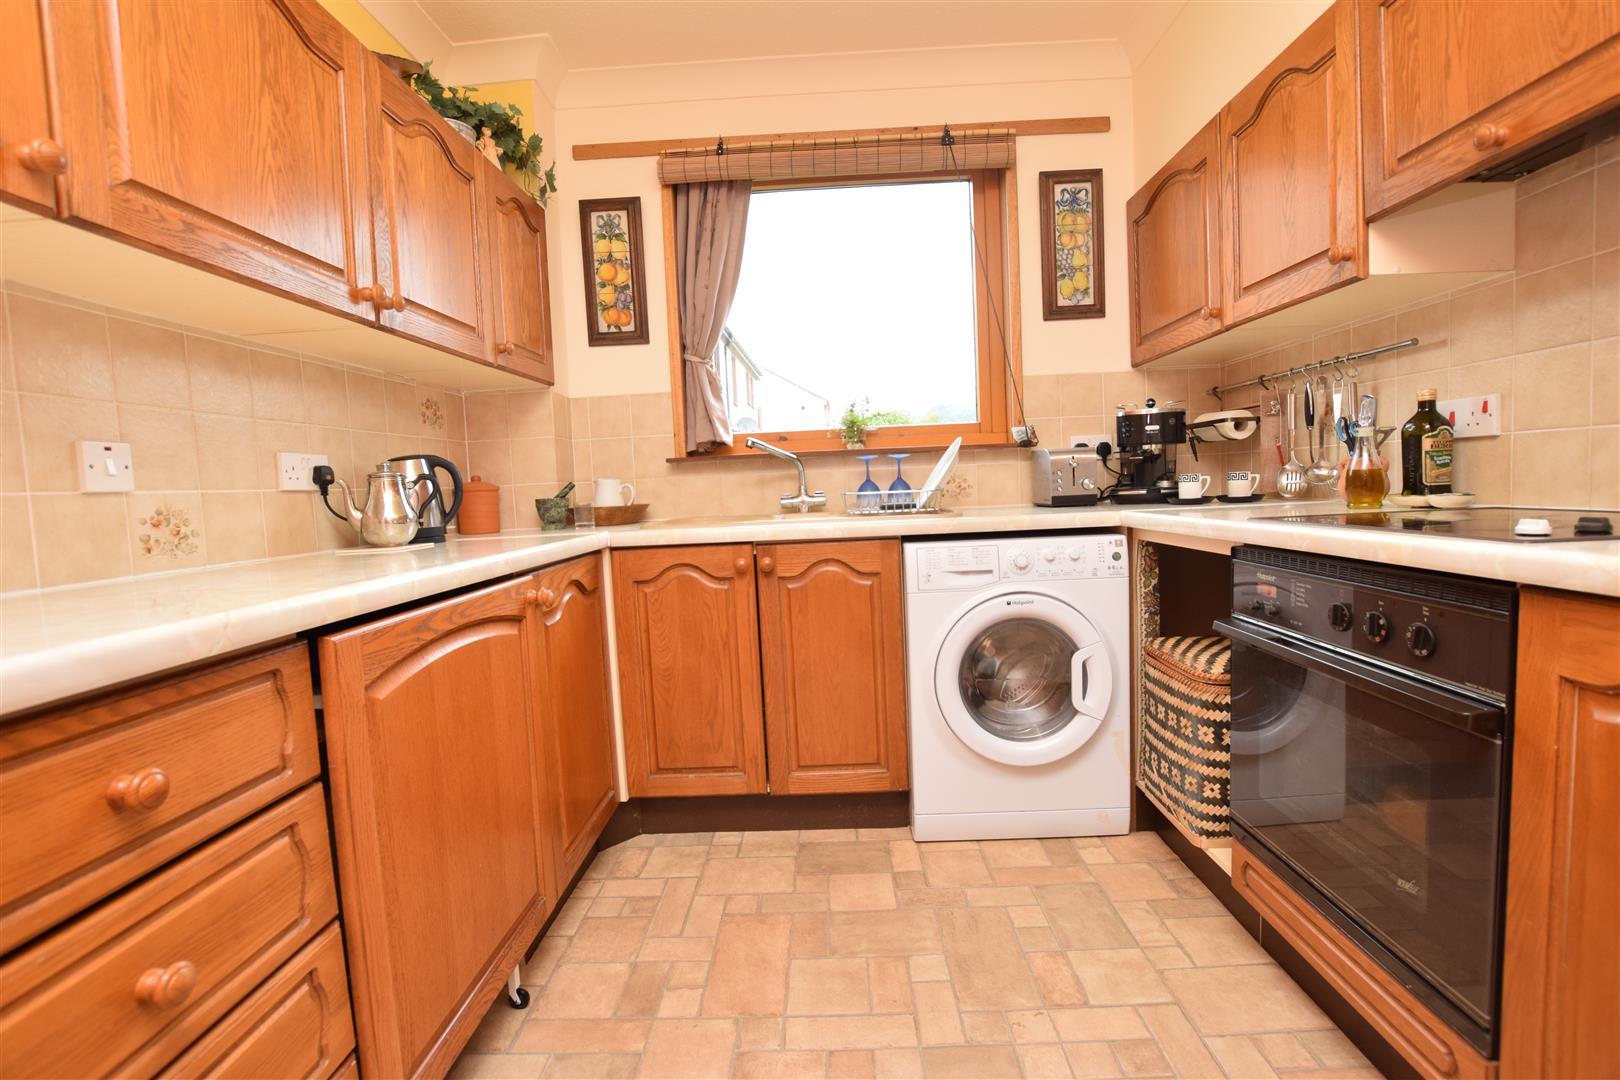 30, Knockard Avenue, Pitlochry, Perthshire, PH16 5JE, UK